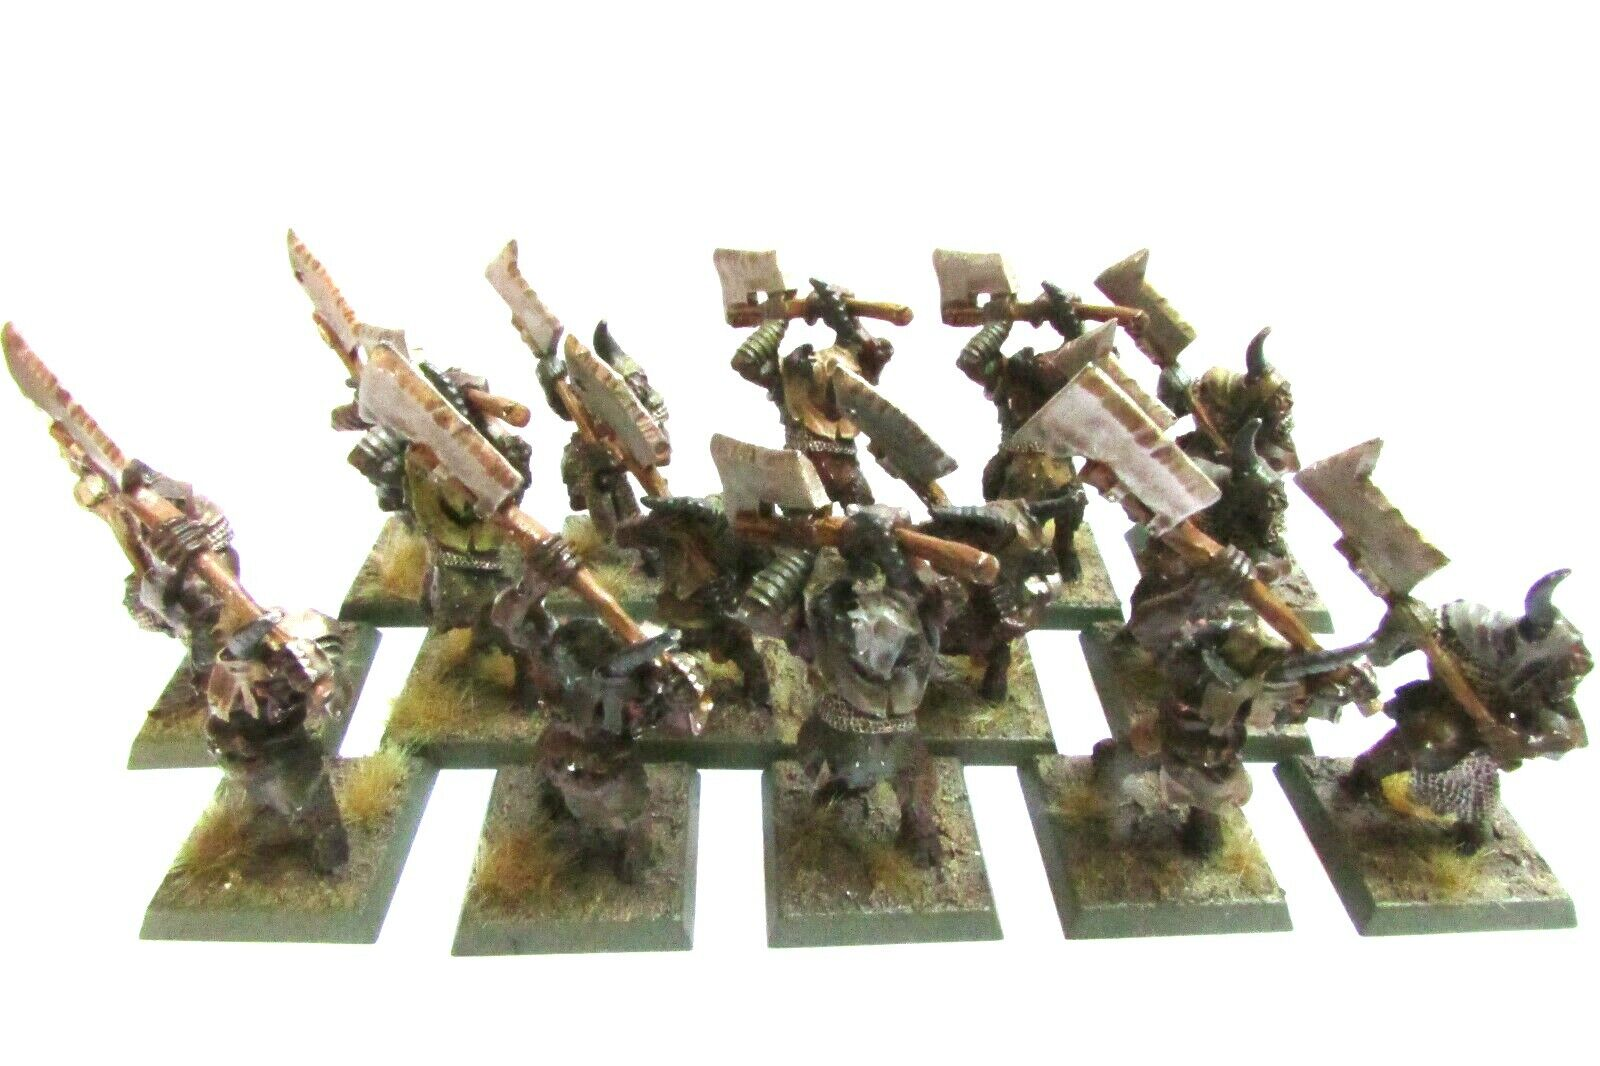 Fuera de imprenta Citadel beastmen Nurgle Pestigor Caos de Warhammer X 15